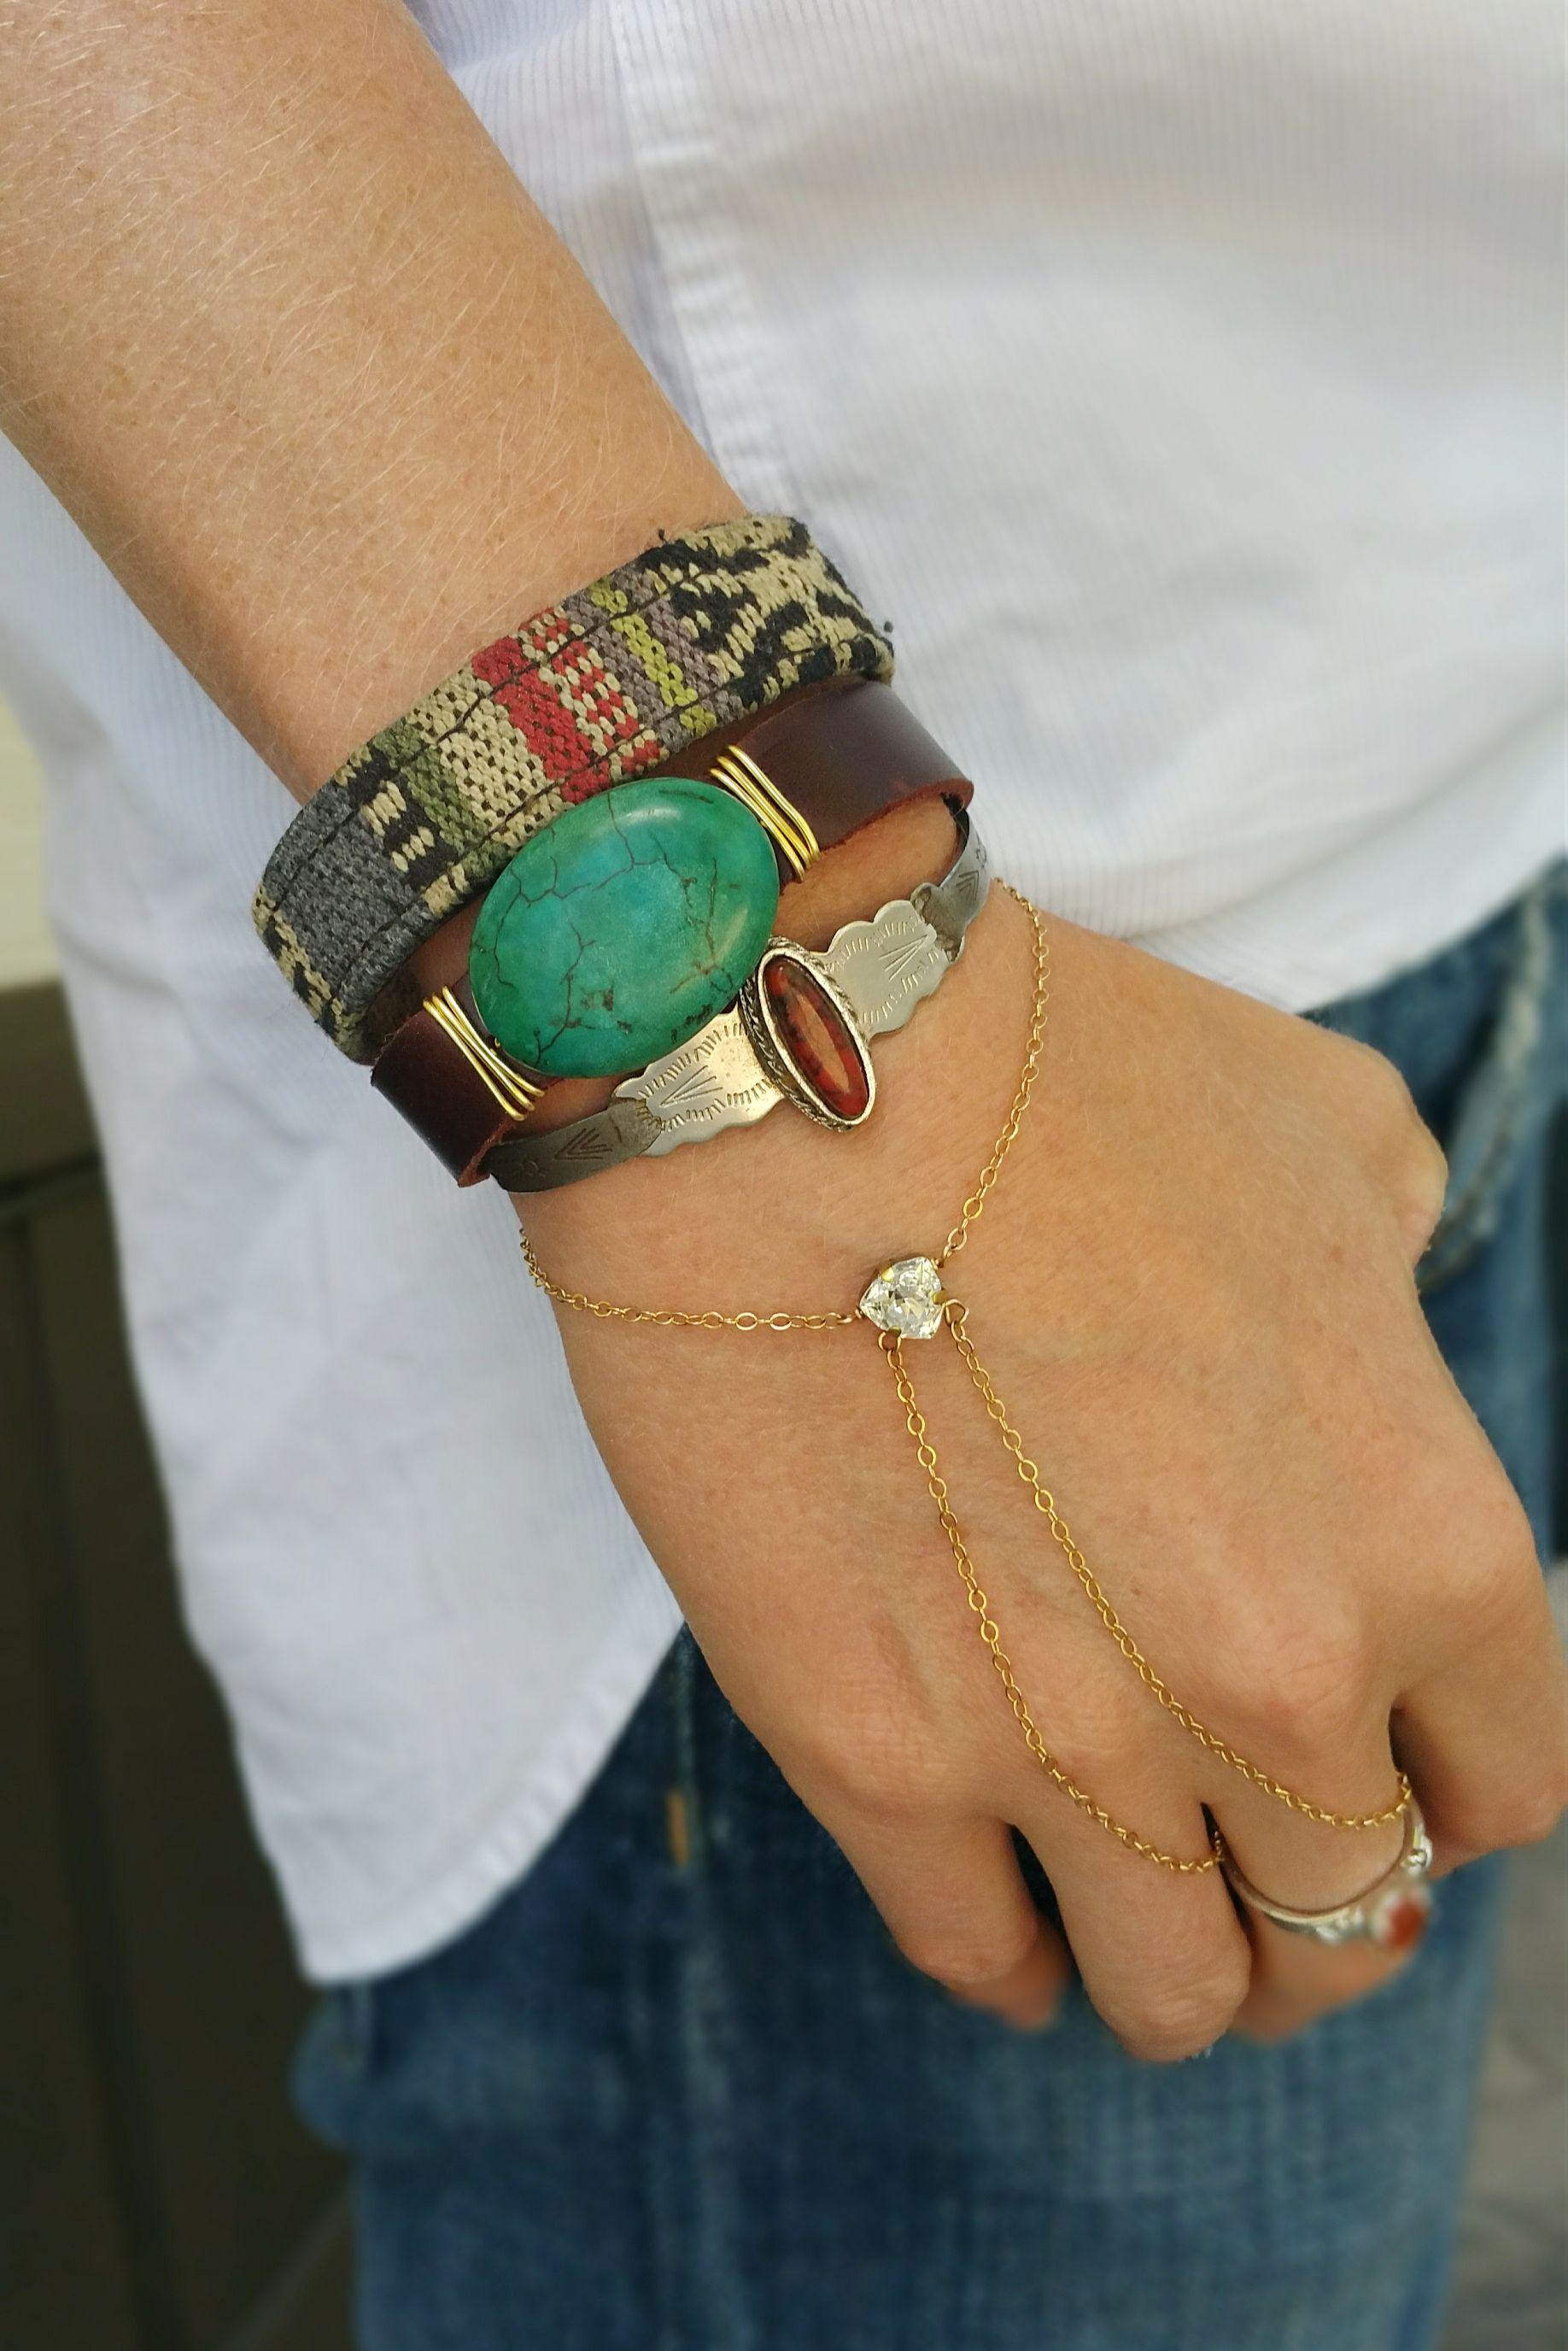 Boho bracelets for days the meg wedding jewelry looped handlet